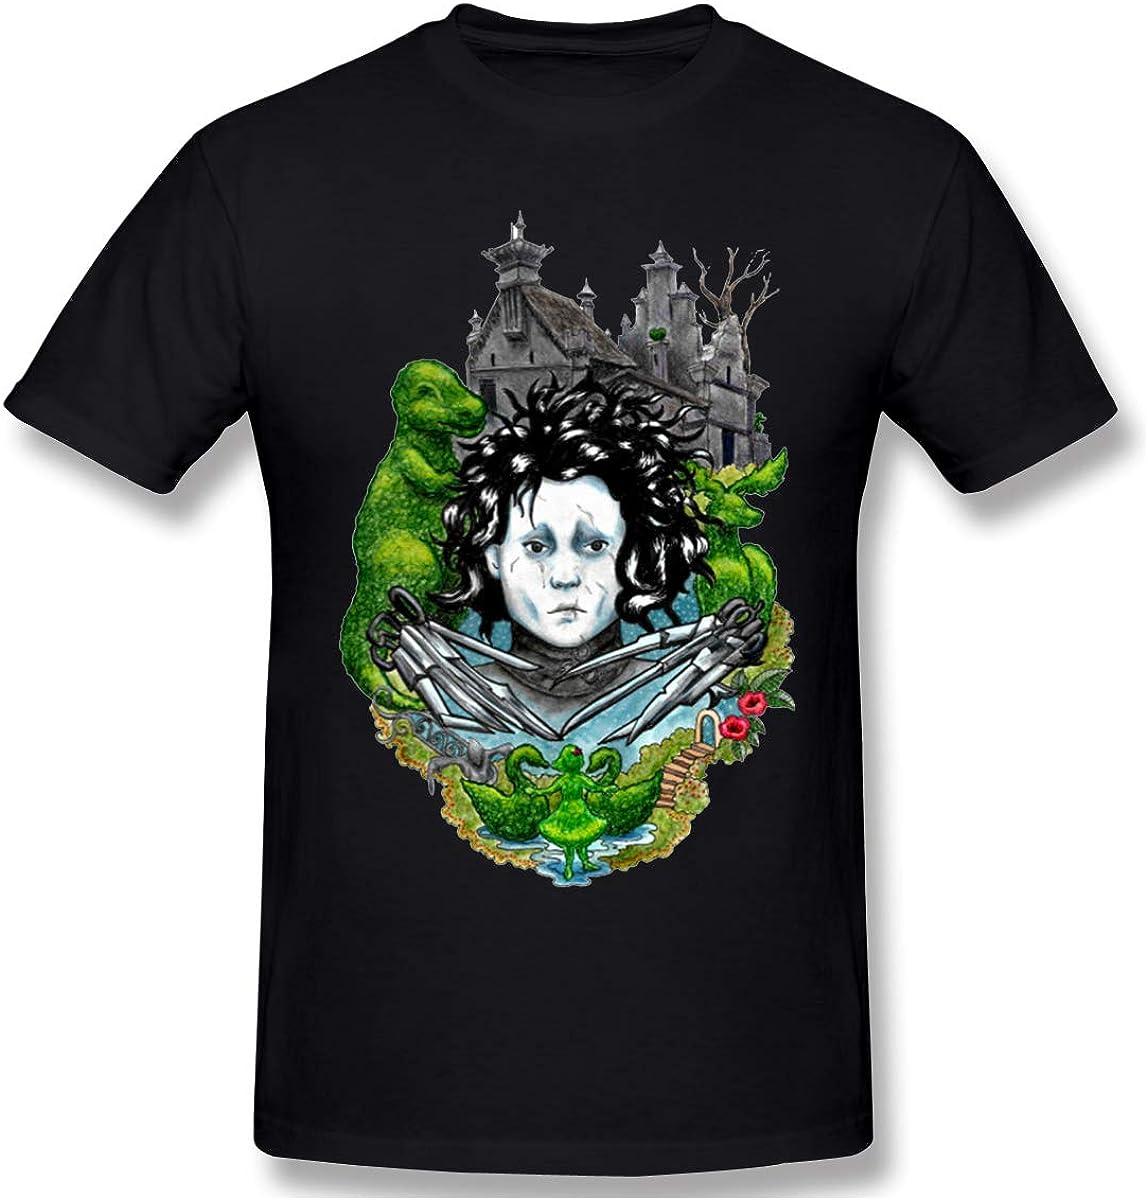 Big Trouble IN Little China Jack/'s Fu Manchu Unisex T-Shirt Alle Größen Farben